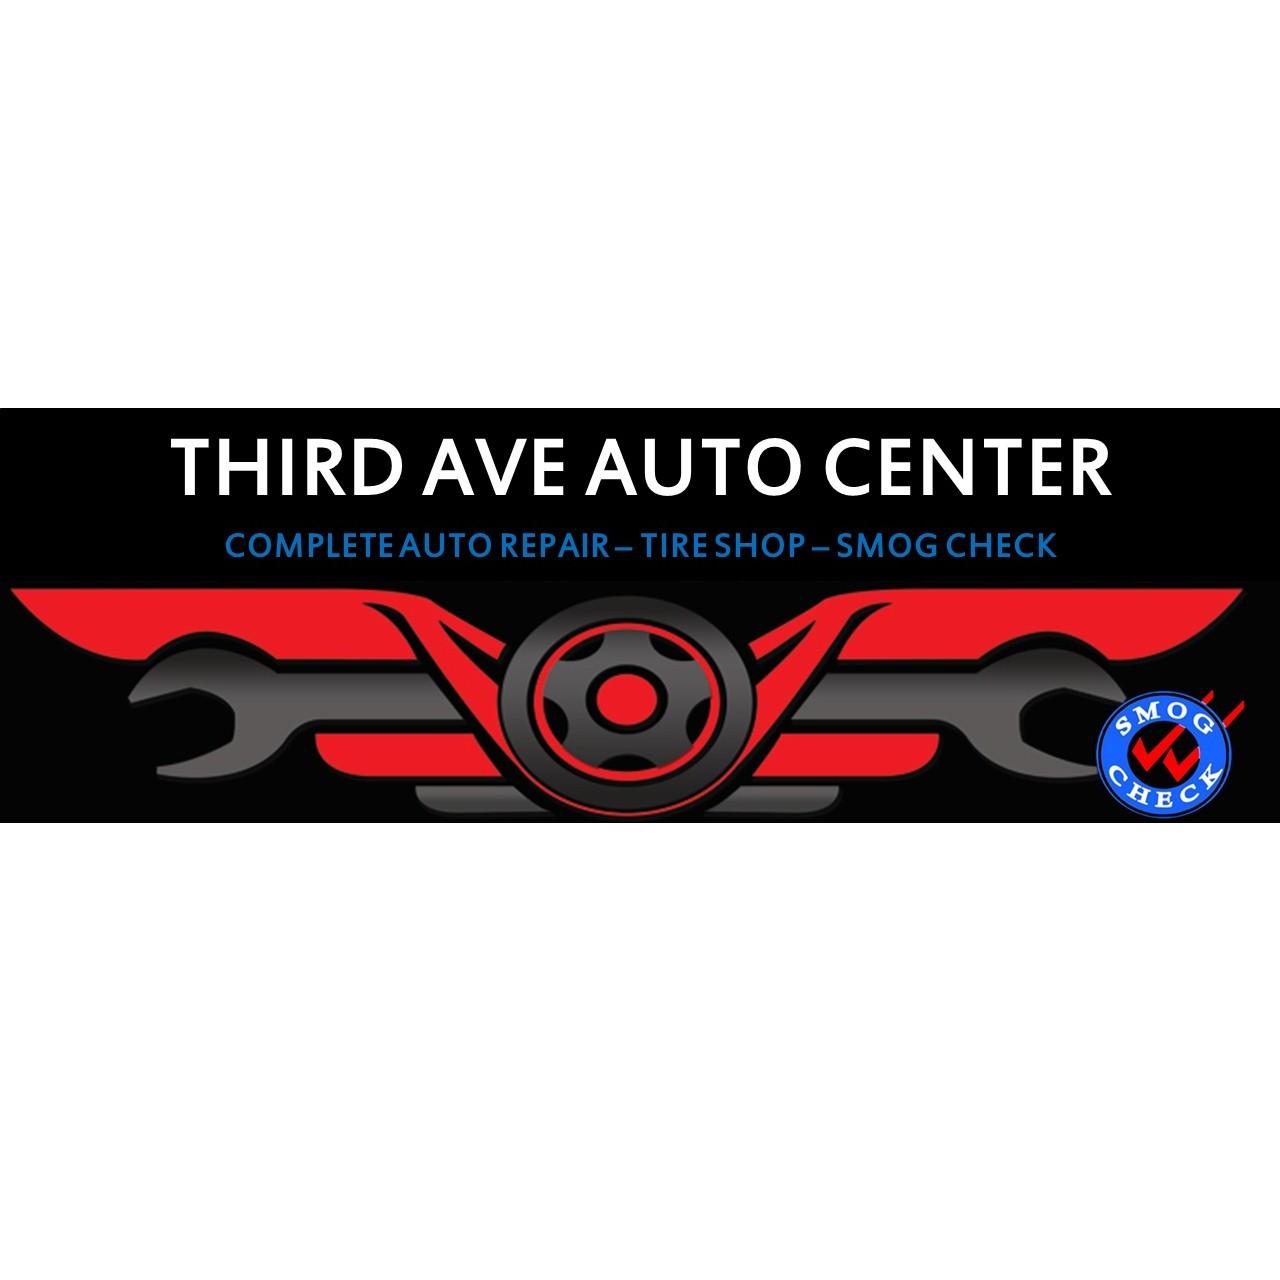 Third Ave Auto Center, Chula Vista California (CA